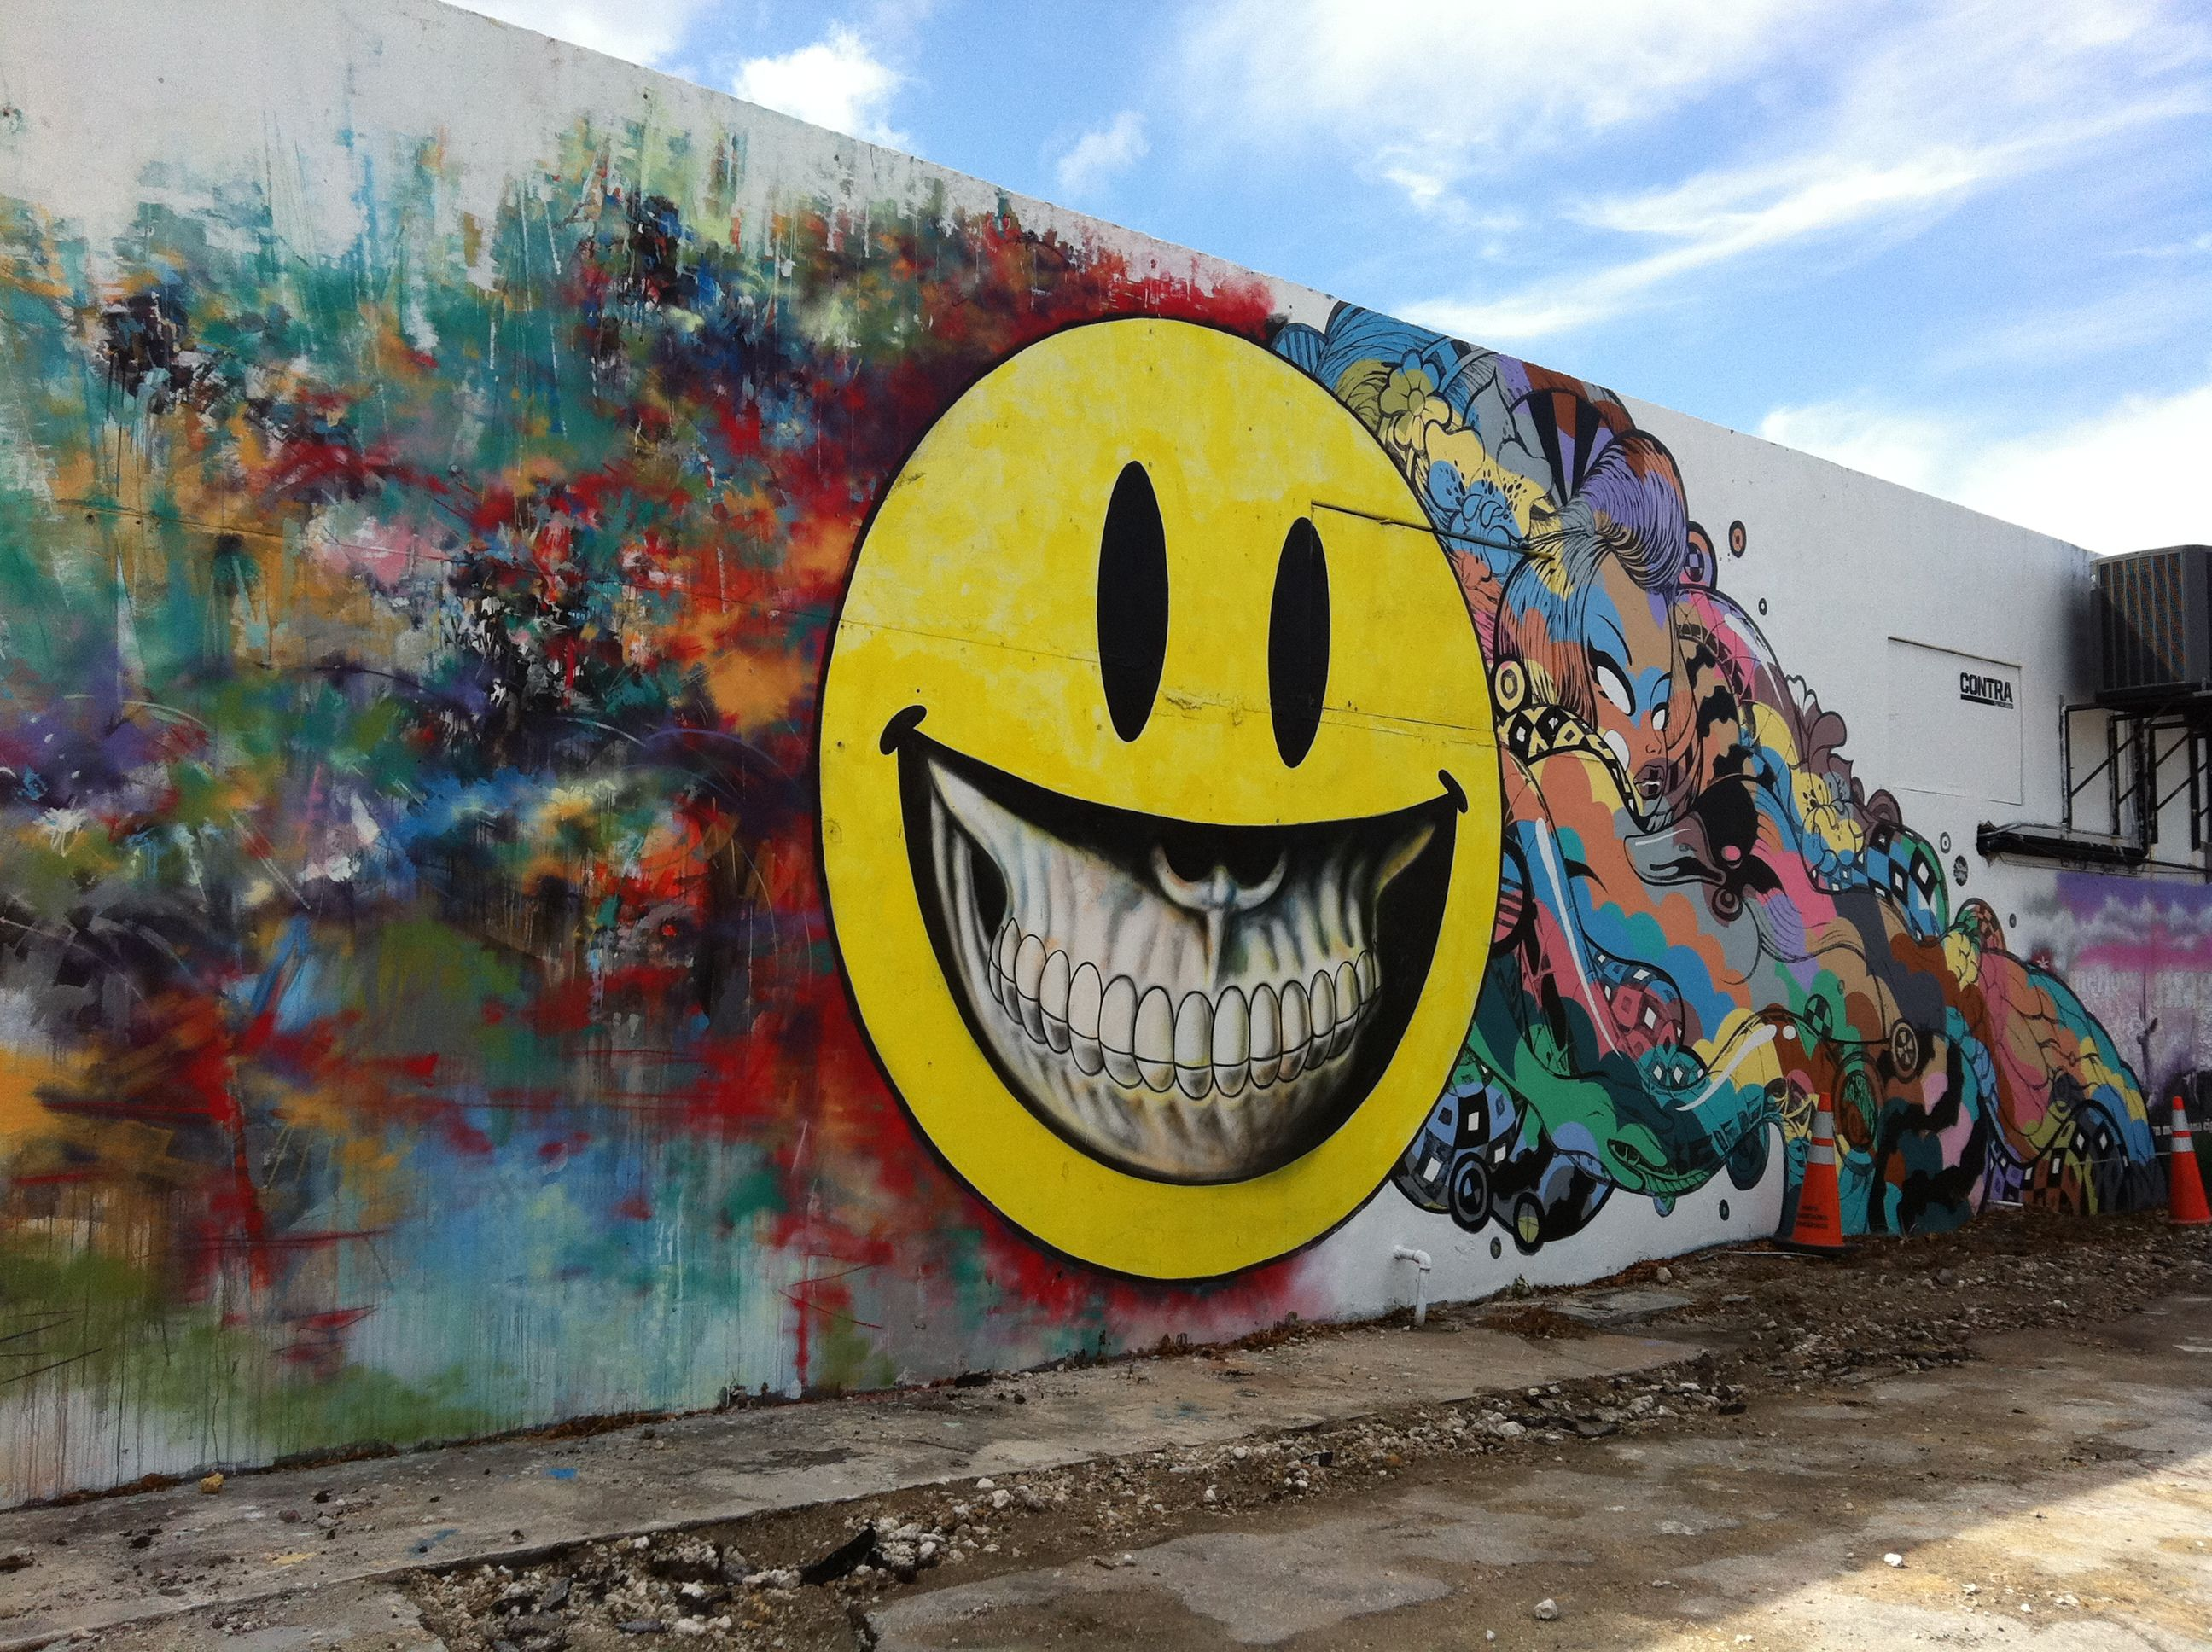 Wynwood #Miami #Graffiti #StreetArt #UrbanArt #Mural | Wild Style ...